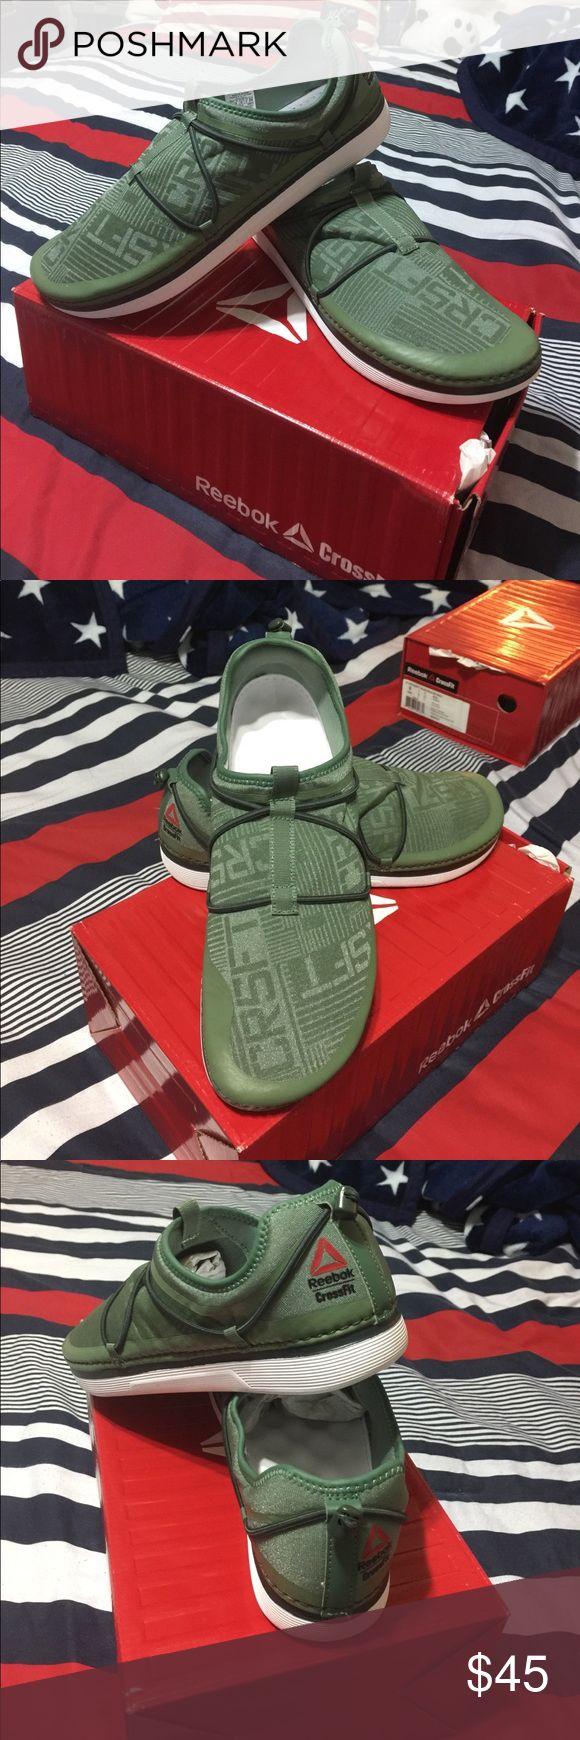 REEBOK CROSSFIT MENS NICE AND ORIGINAL REEBOK CROSSFIT SNEAKERS SIZE 9. MENS Reebok Shoes Sneakers